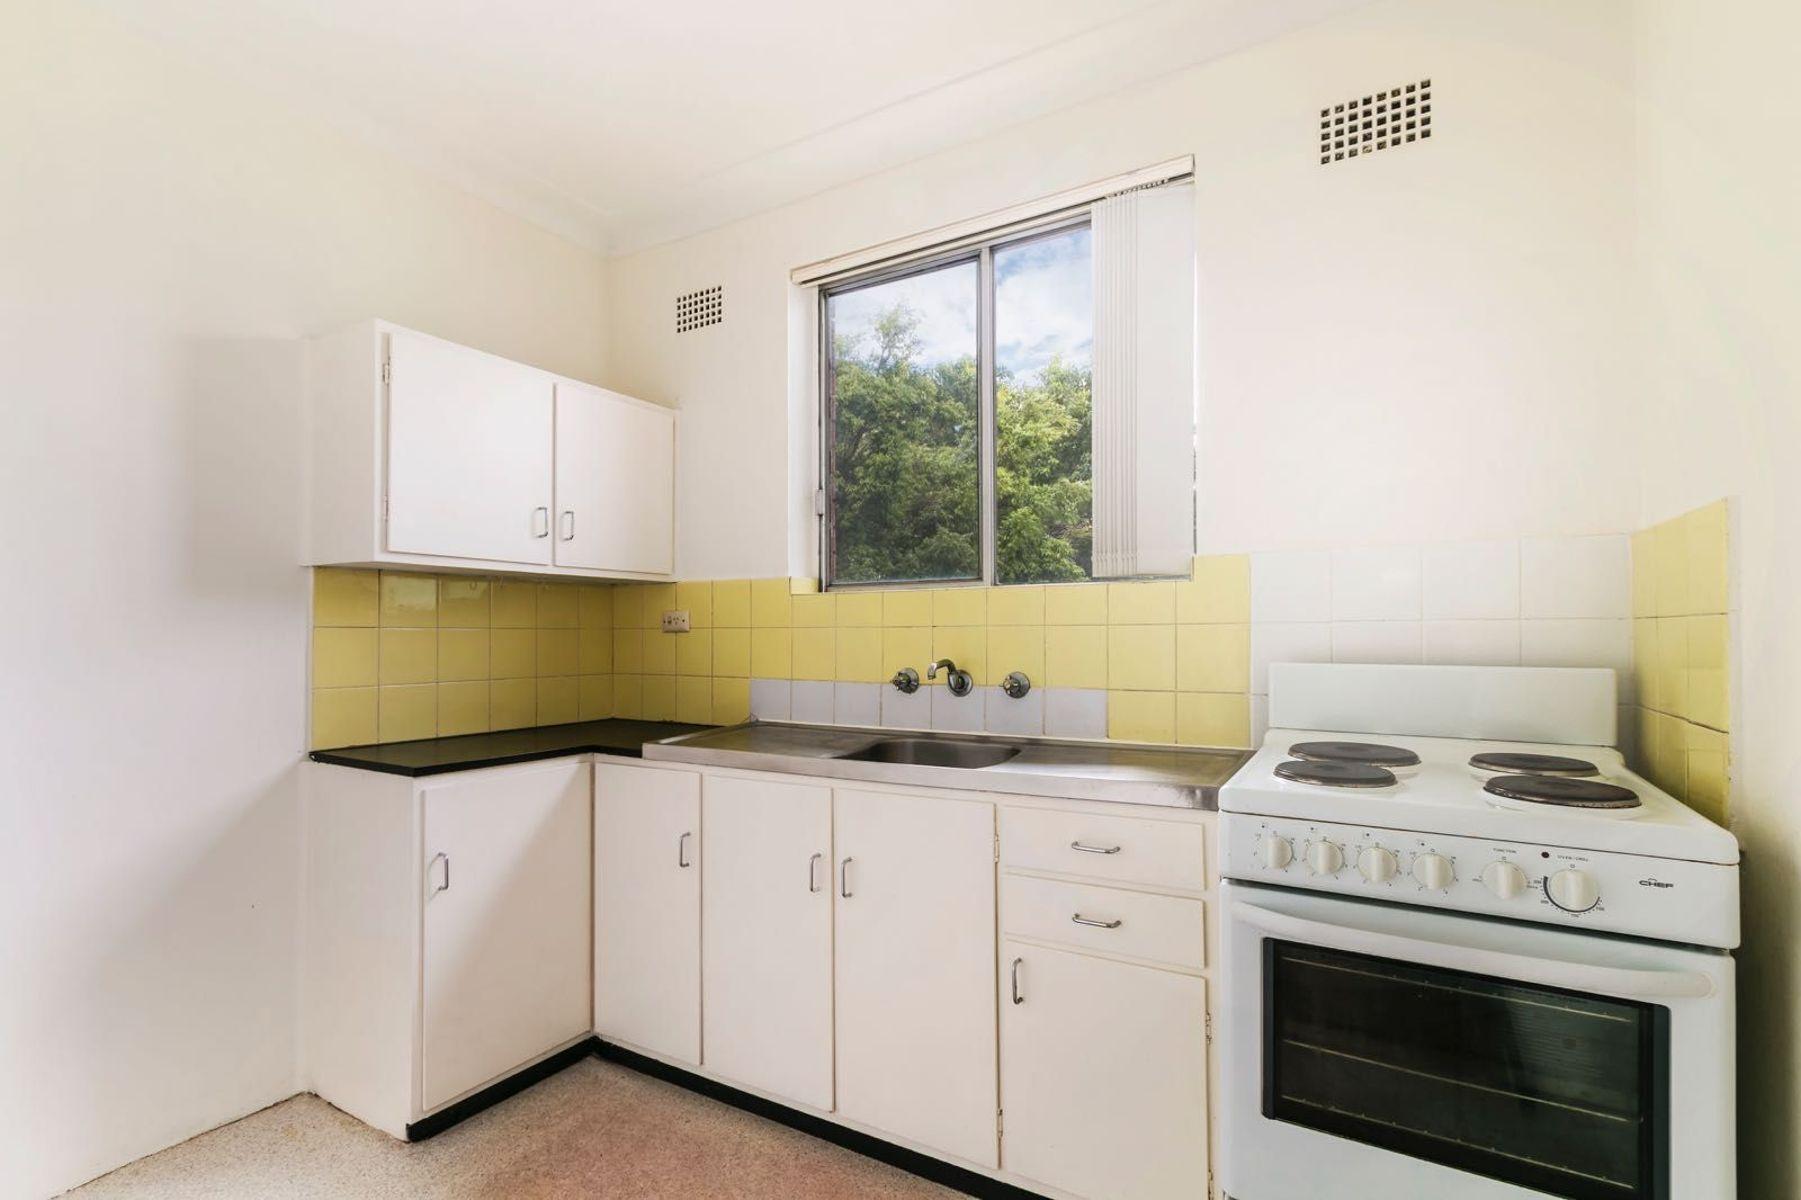 7/18 John Street, Newtown, NSW 2042